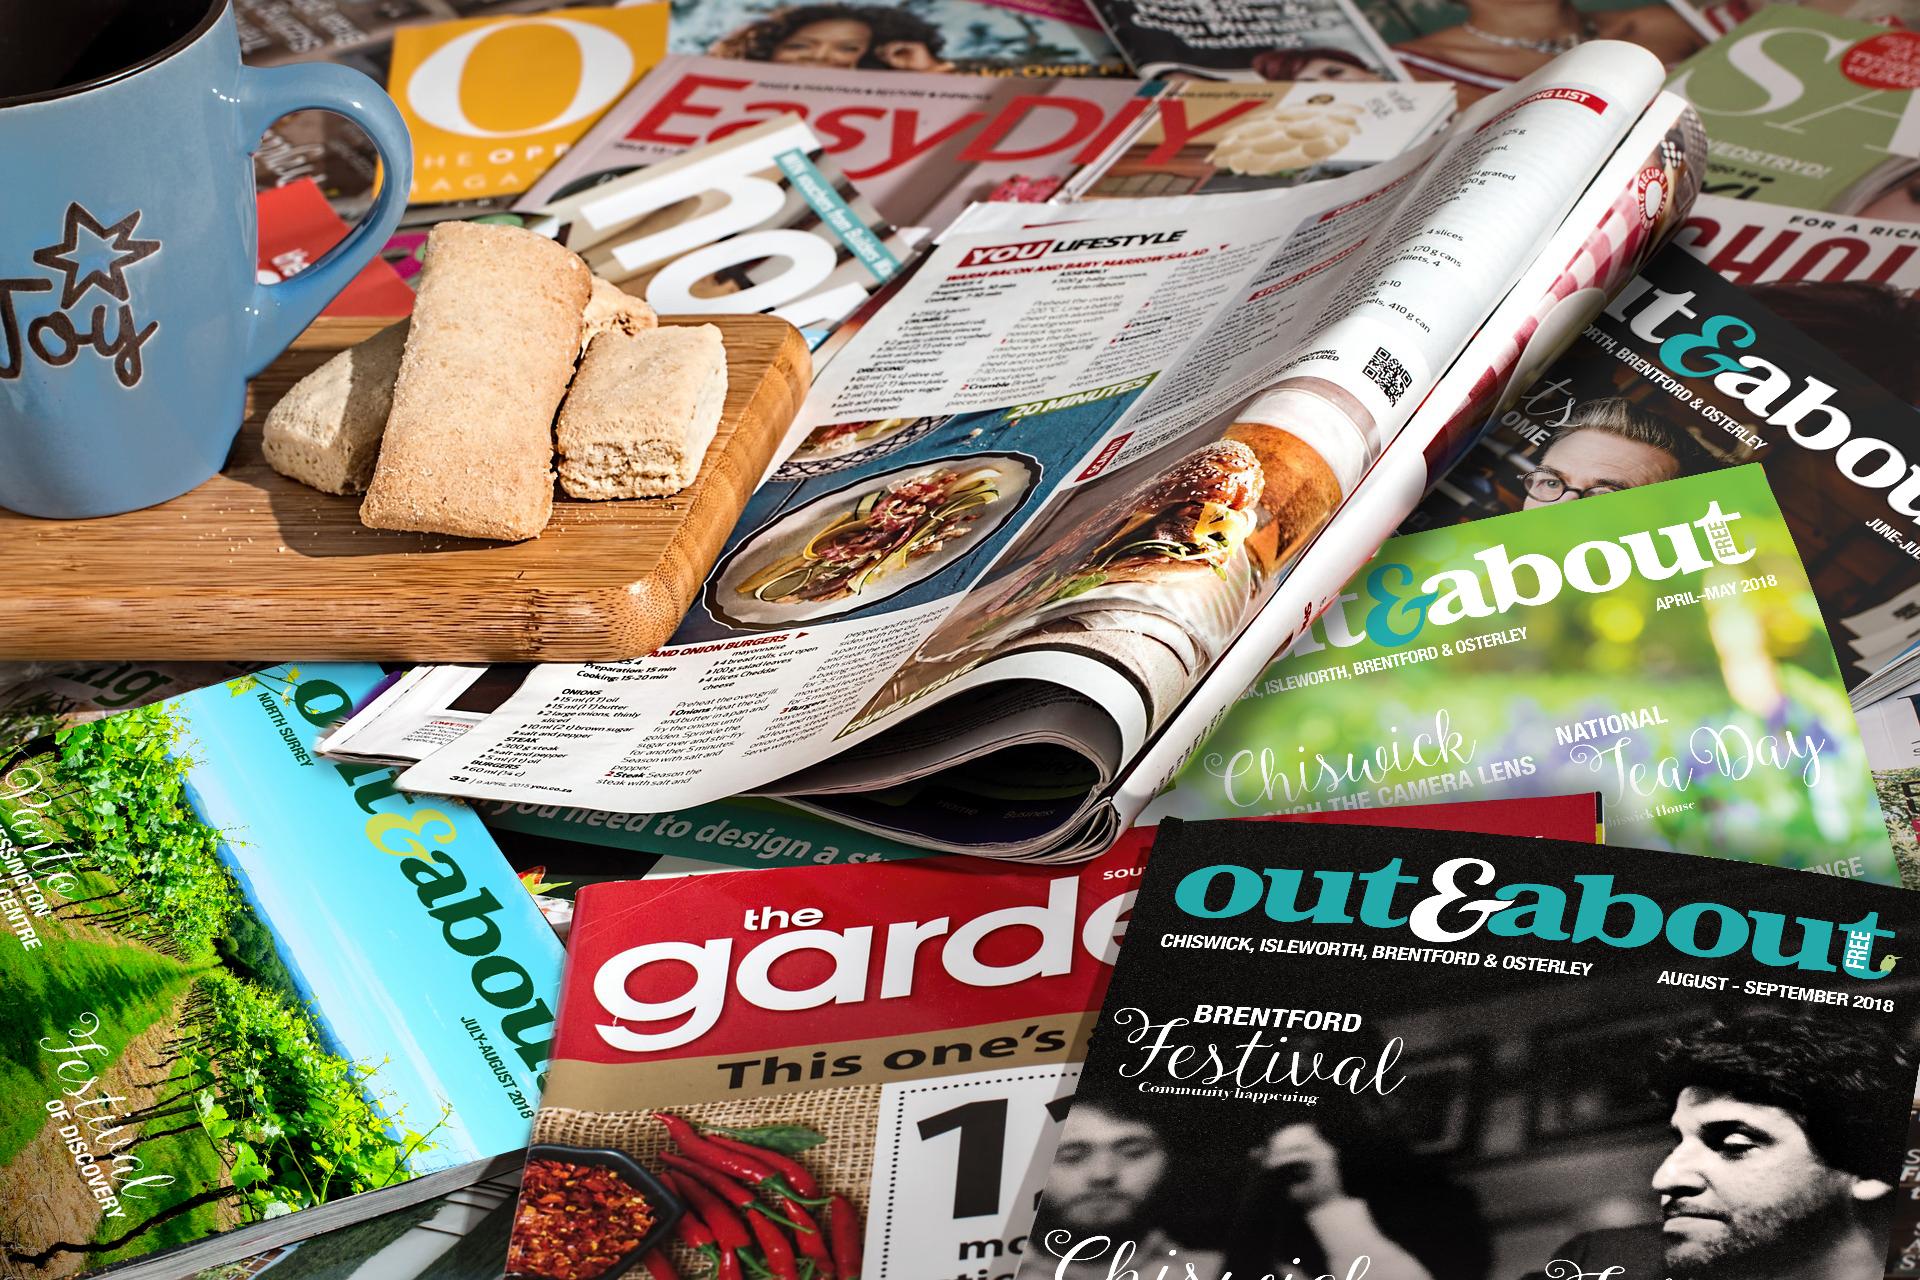 magazines-piled up.jpg